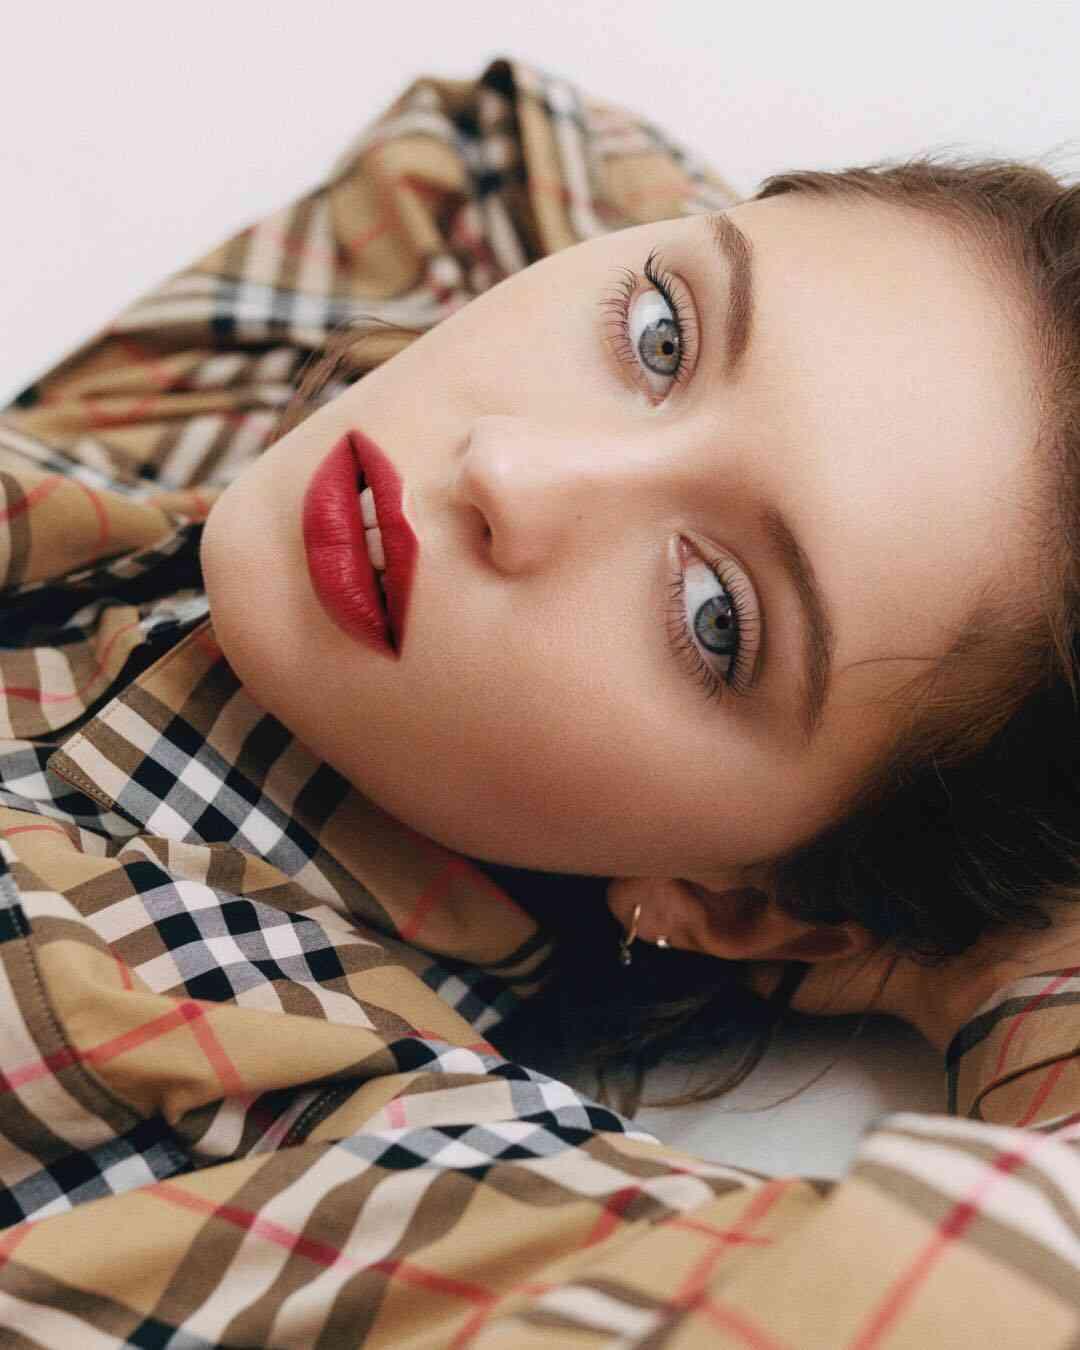 Iris LawさんはInstagramを利用しています:「Thank you @burberry mwah #Burberrybeauty #lipvelvetcrush」